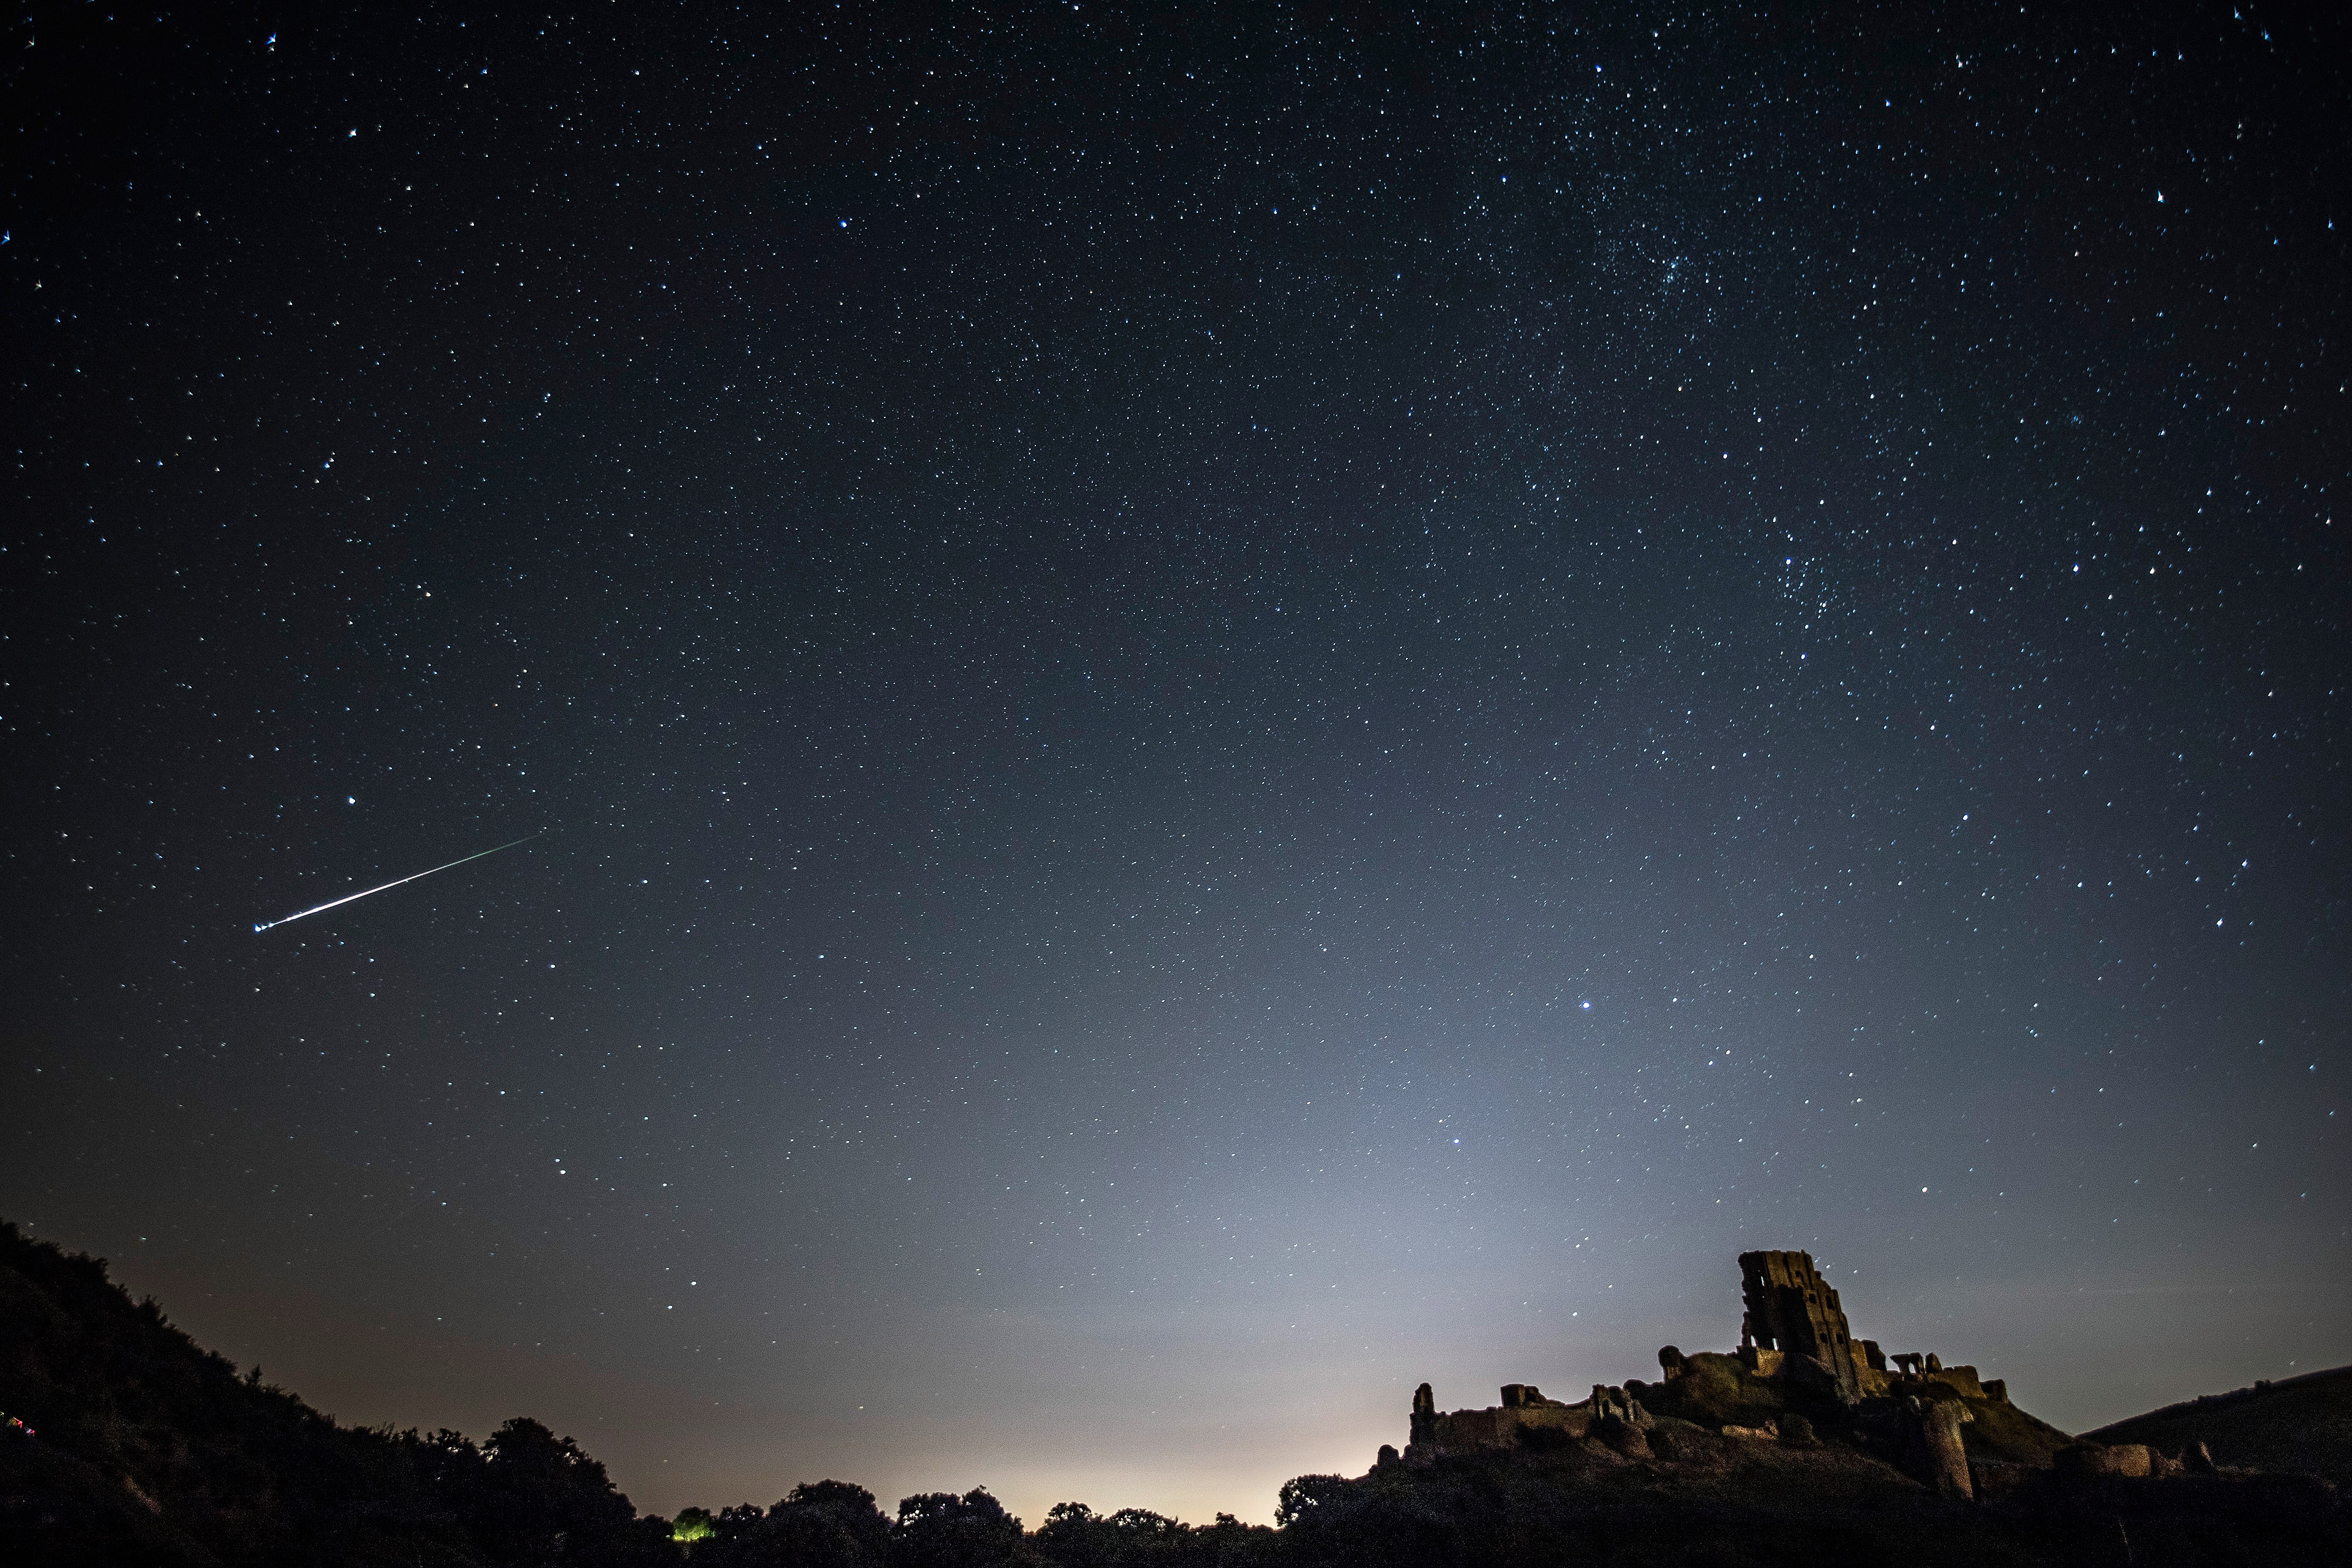 Geminid Meteor Shower Peaks Tonight: Watch It Live